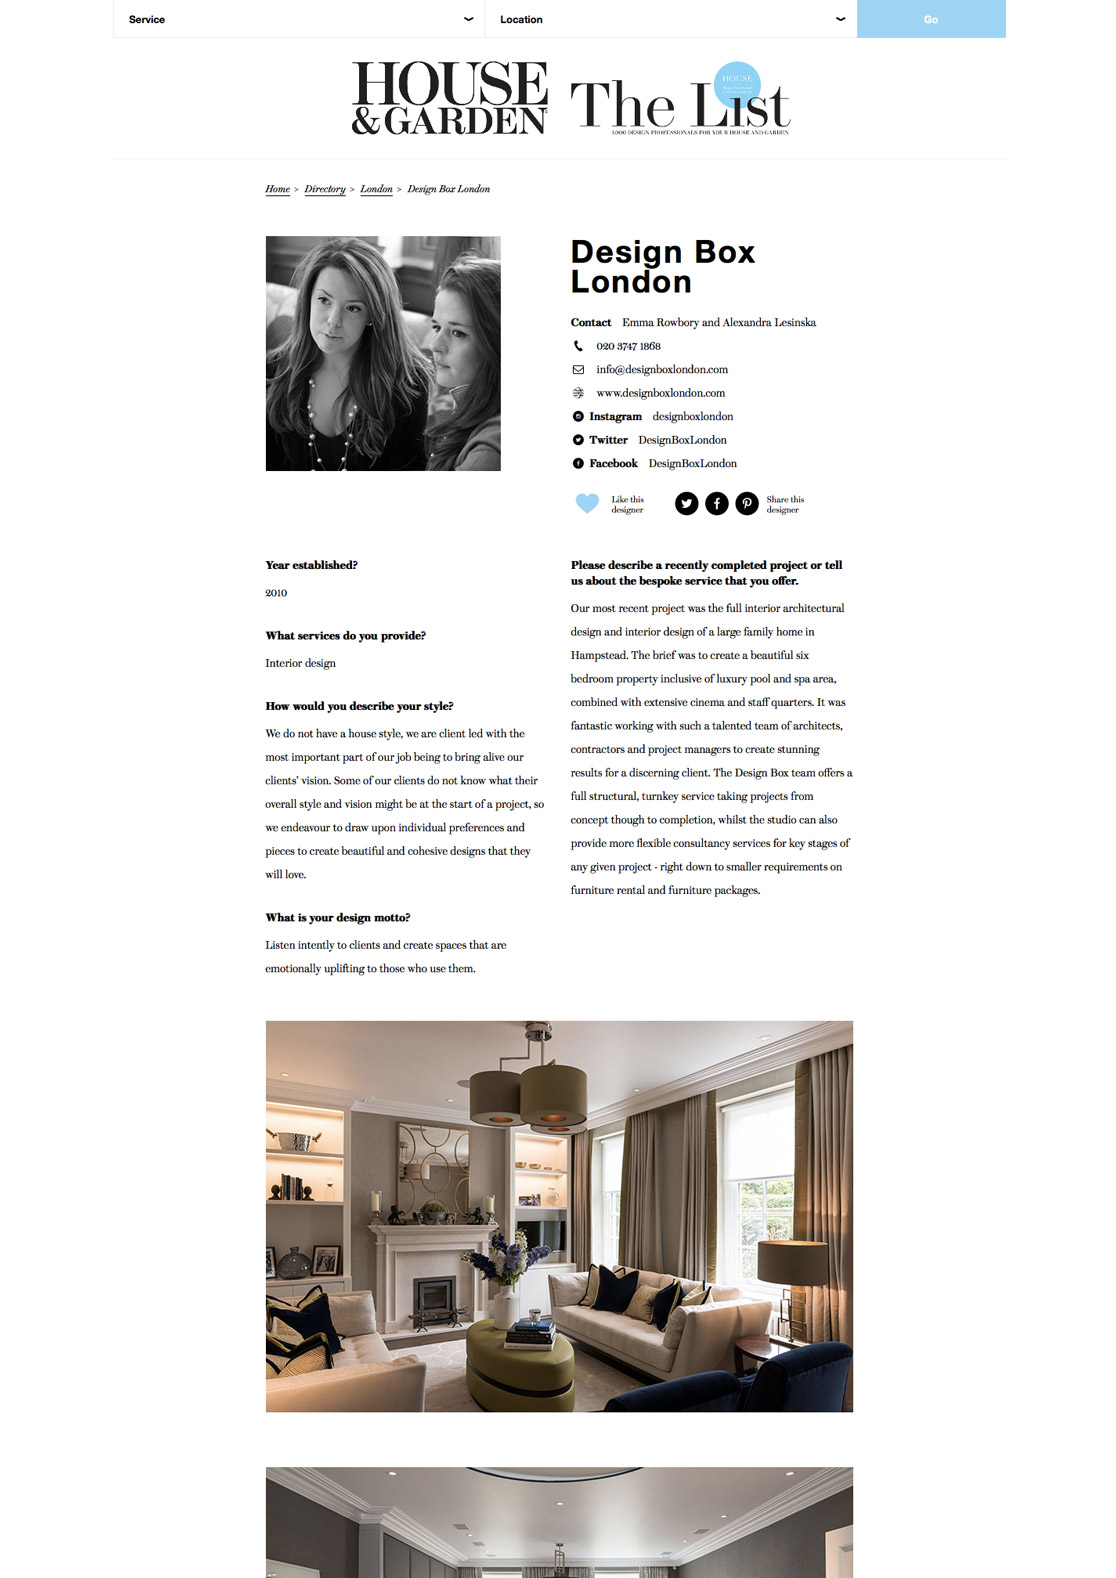 Press design box london luxury interior design services - The interiorlist ...